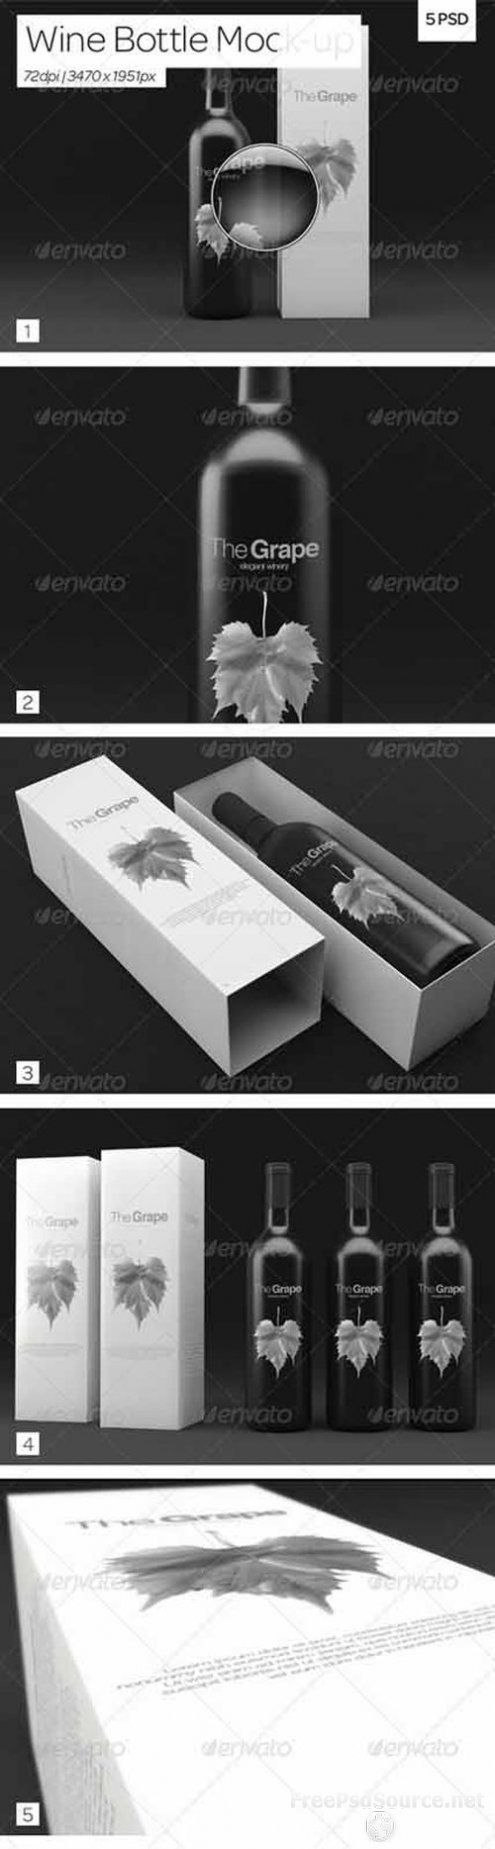 Download Psd Wine Bottle Packaging Mock Up Graphicriver Free Free Download Psd Source Tutorials Vect Wine Bottle Packaging Bottle Packaging Wine Bottle Design